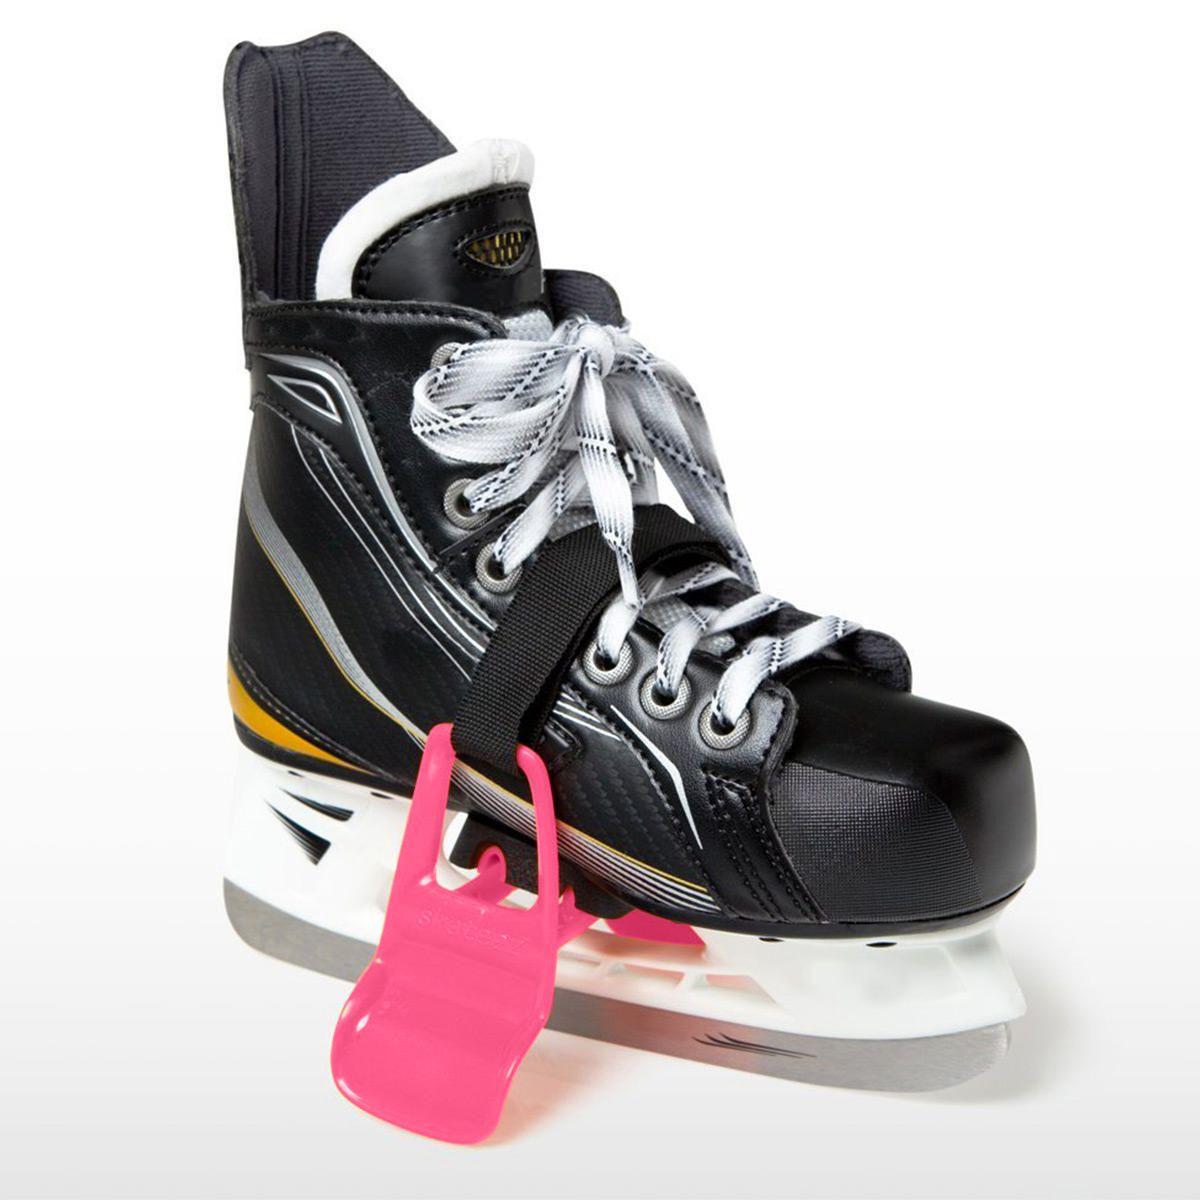 Skateez Skate Trainer | Walmart Canada